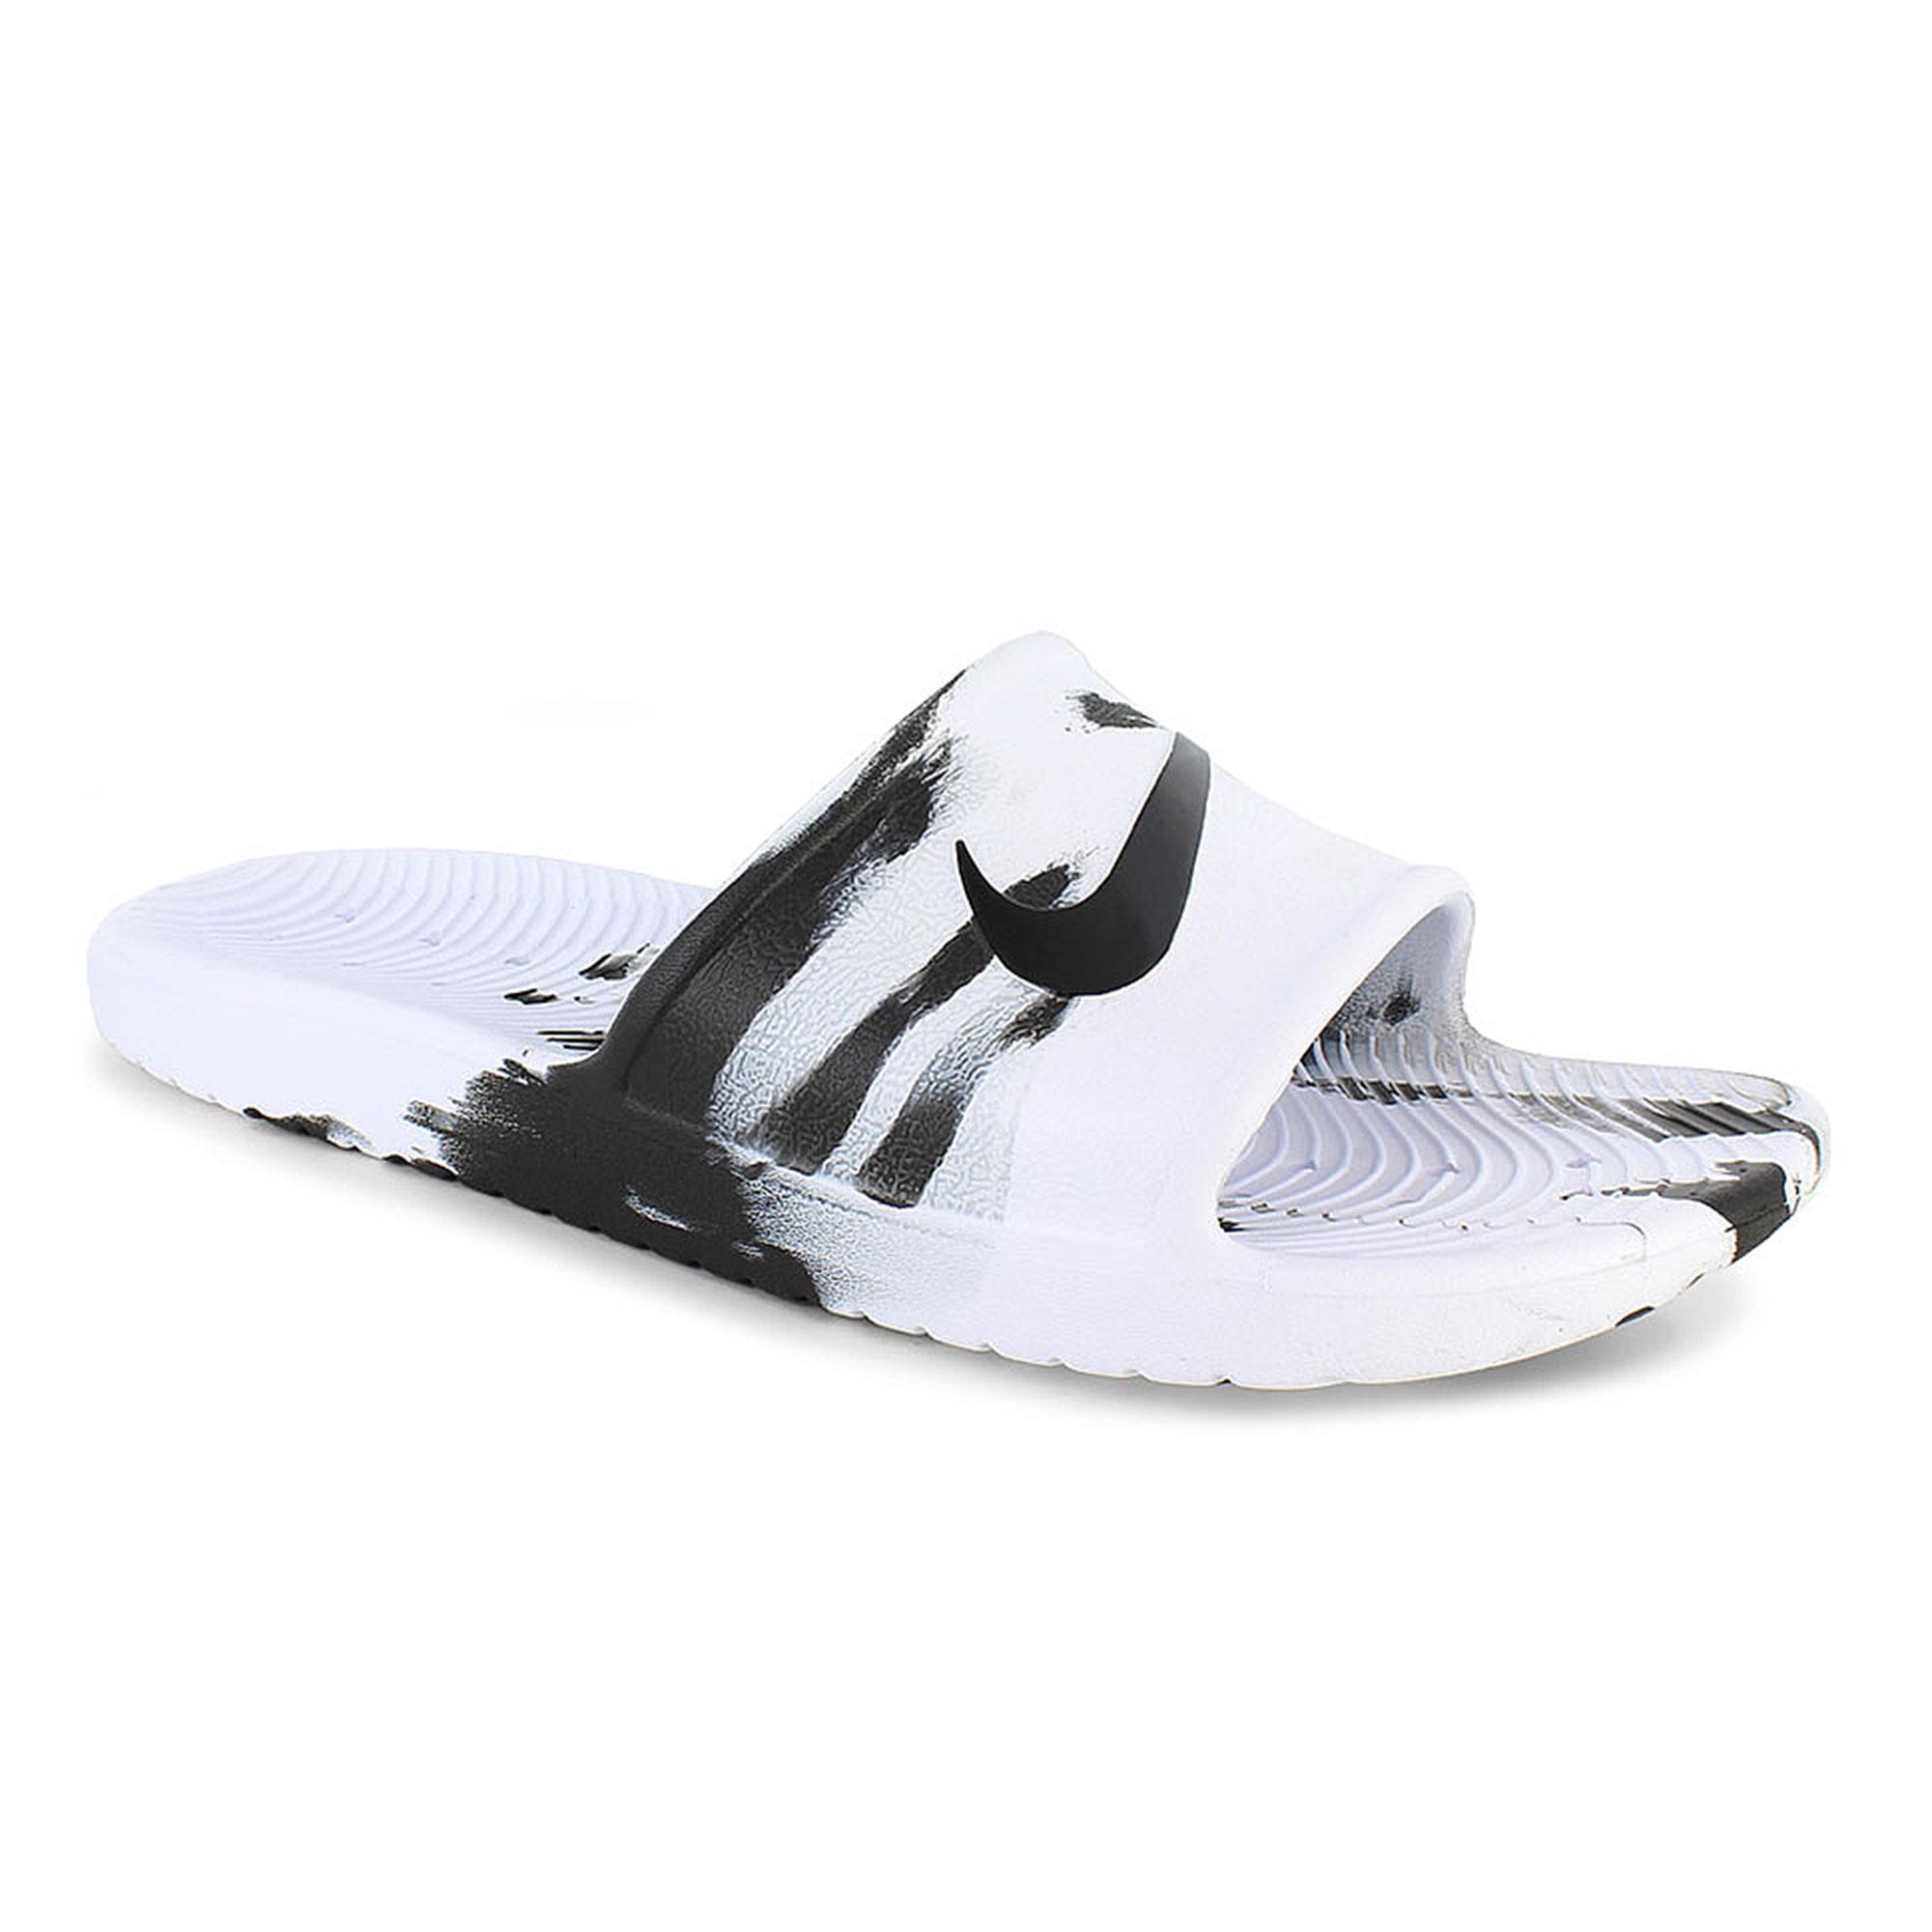 08d28cfe9fe90 Nike Kawa Shower Marble